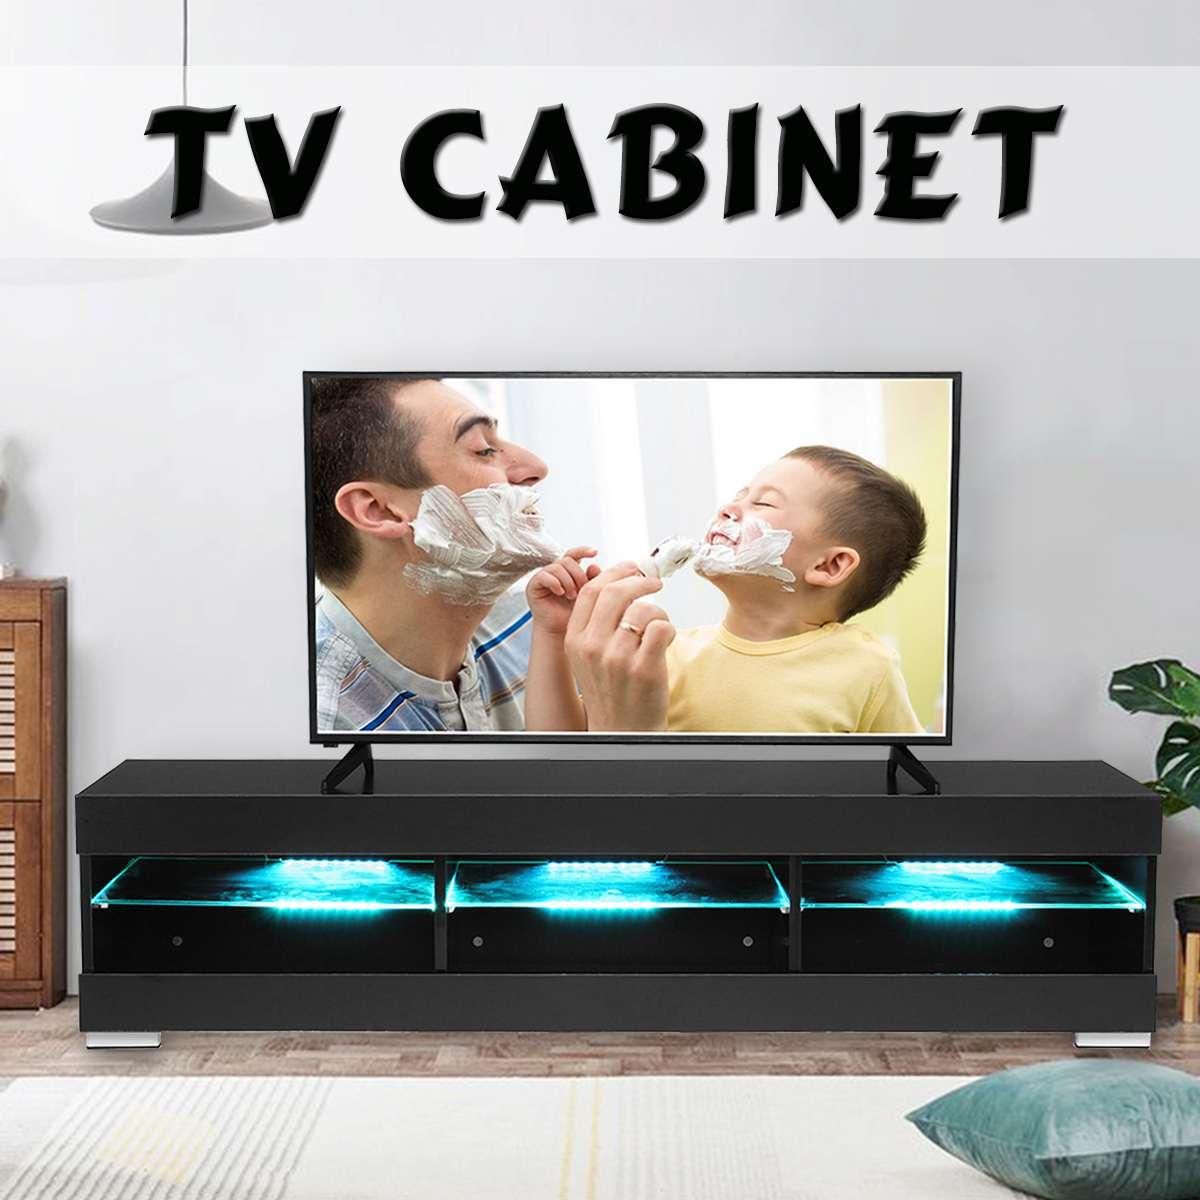 57'' TV Unit Cabinet Stand LED Light High Gloss White Black Wood Table  Living Room Meuble TV Bedroom Furniture Desk US Shipping